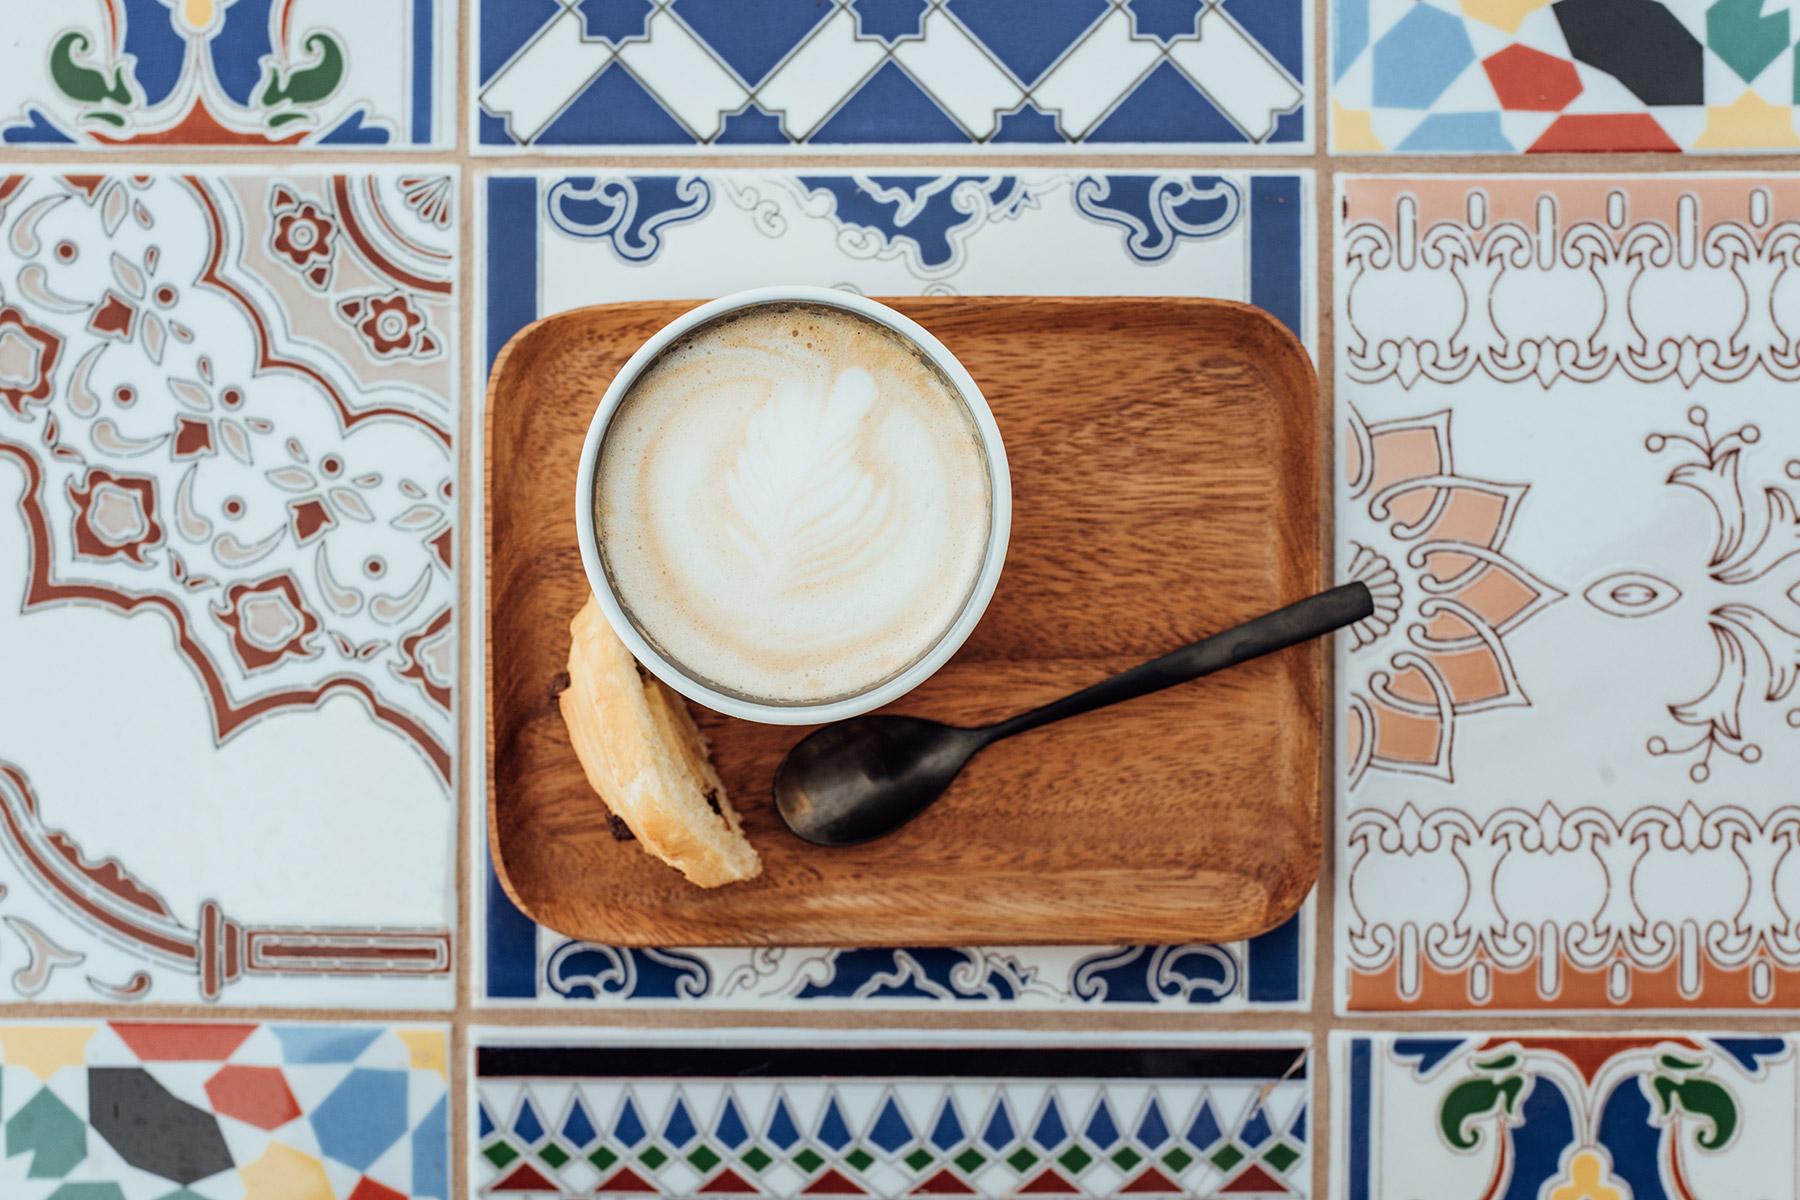 Geheimtipp Hamburg Altona Café NOLOSO Lisa Knauer 14